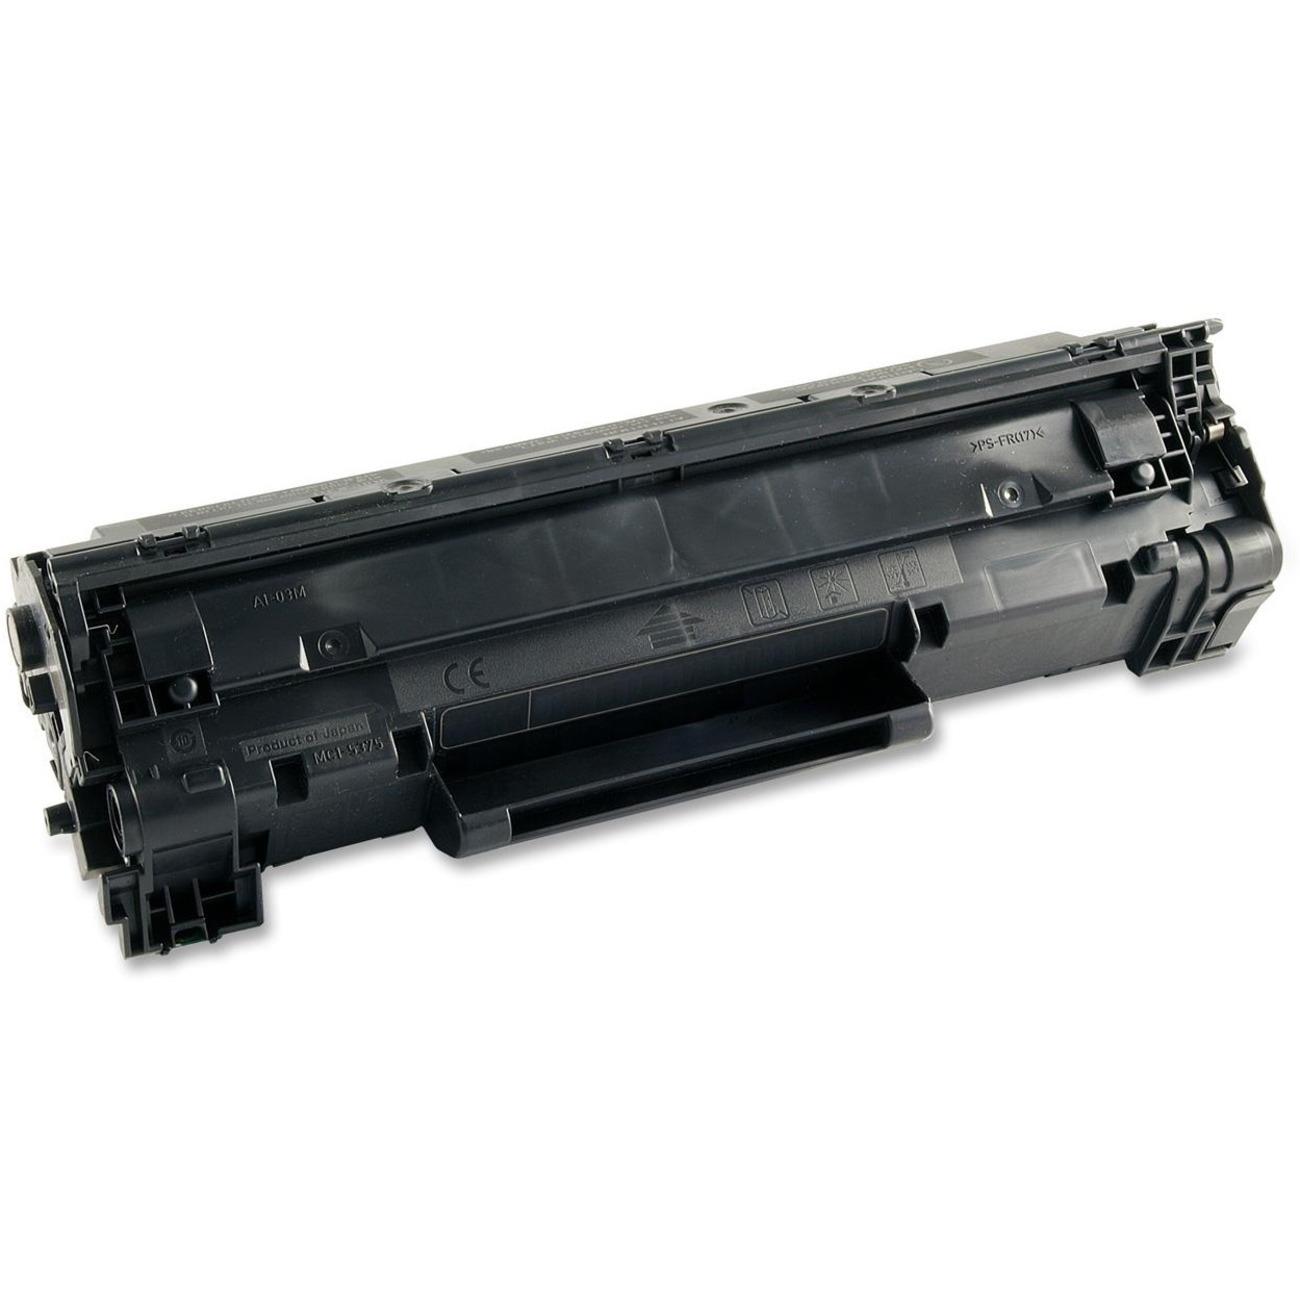 Smartchoice Remanufactured Toner Cartridge Alternative For Hp 85a Catridge Ce285a Black